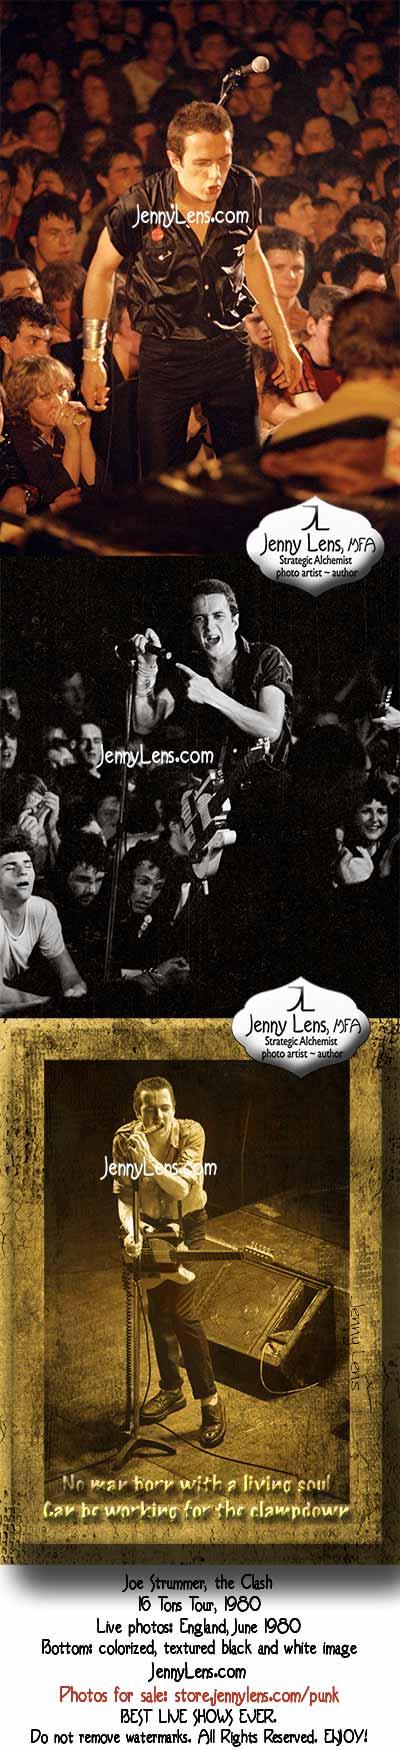 Joe Strummer, Clash, 16 Tons Tour England, June 1980. Incredible. Jenny Lens MFA